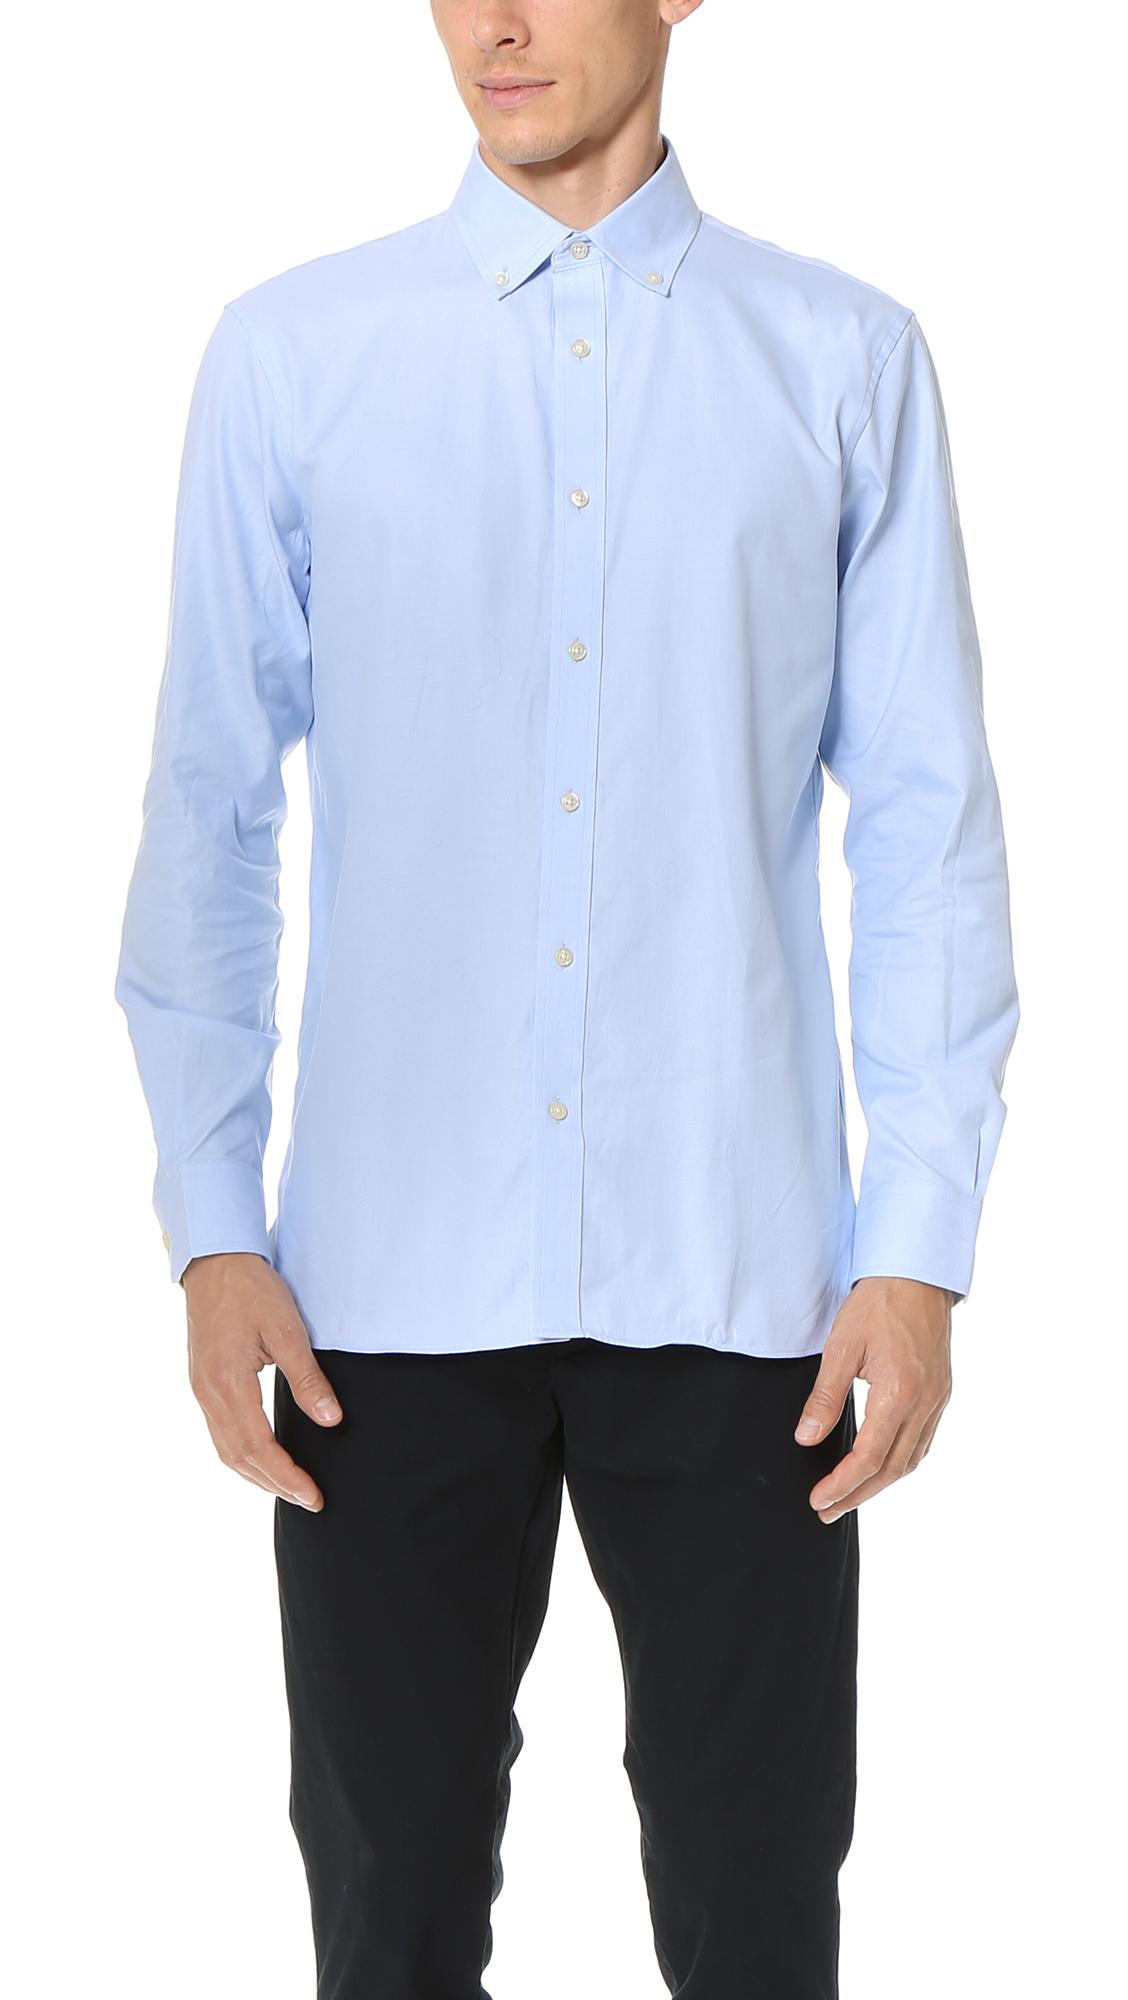 fb5e1f3ce20 Club Monaco Slim Button Down Dress Oxford Shirt In Blue